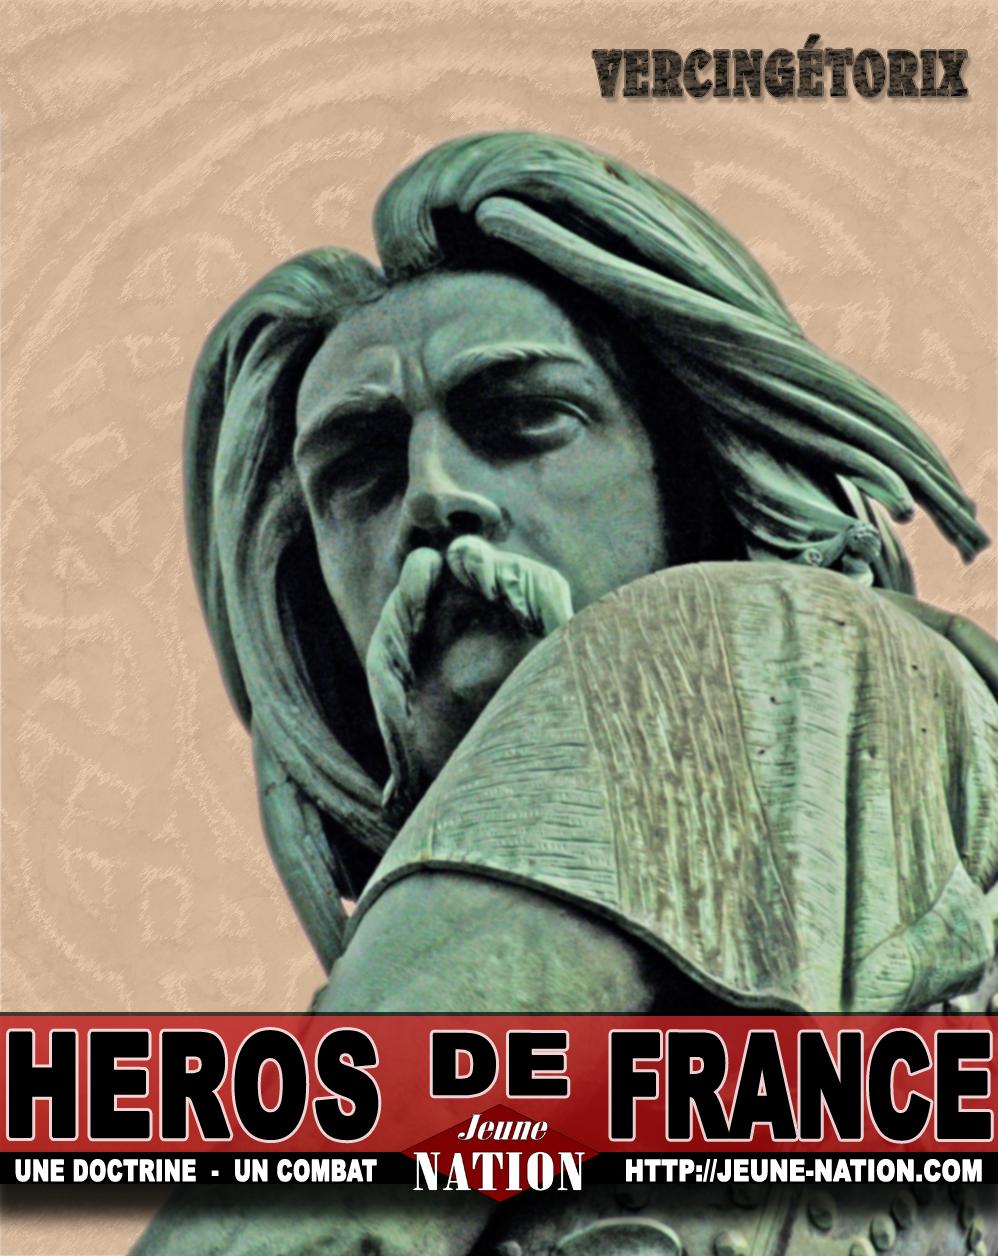 heros-de-france-vercingetorix-jeune-nation---